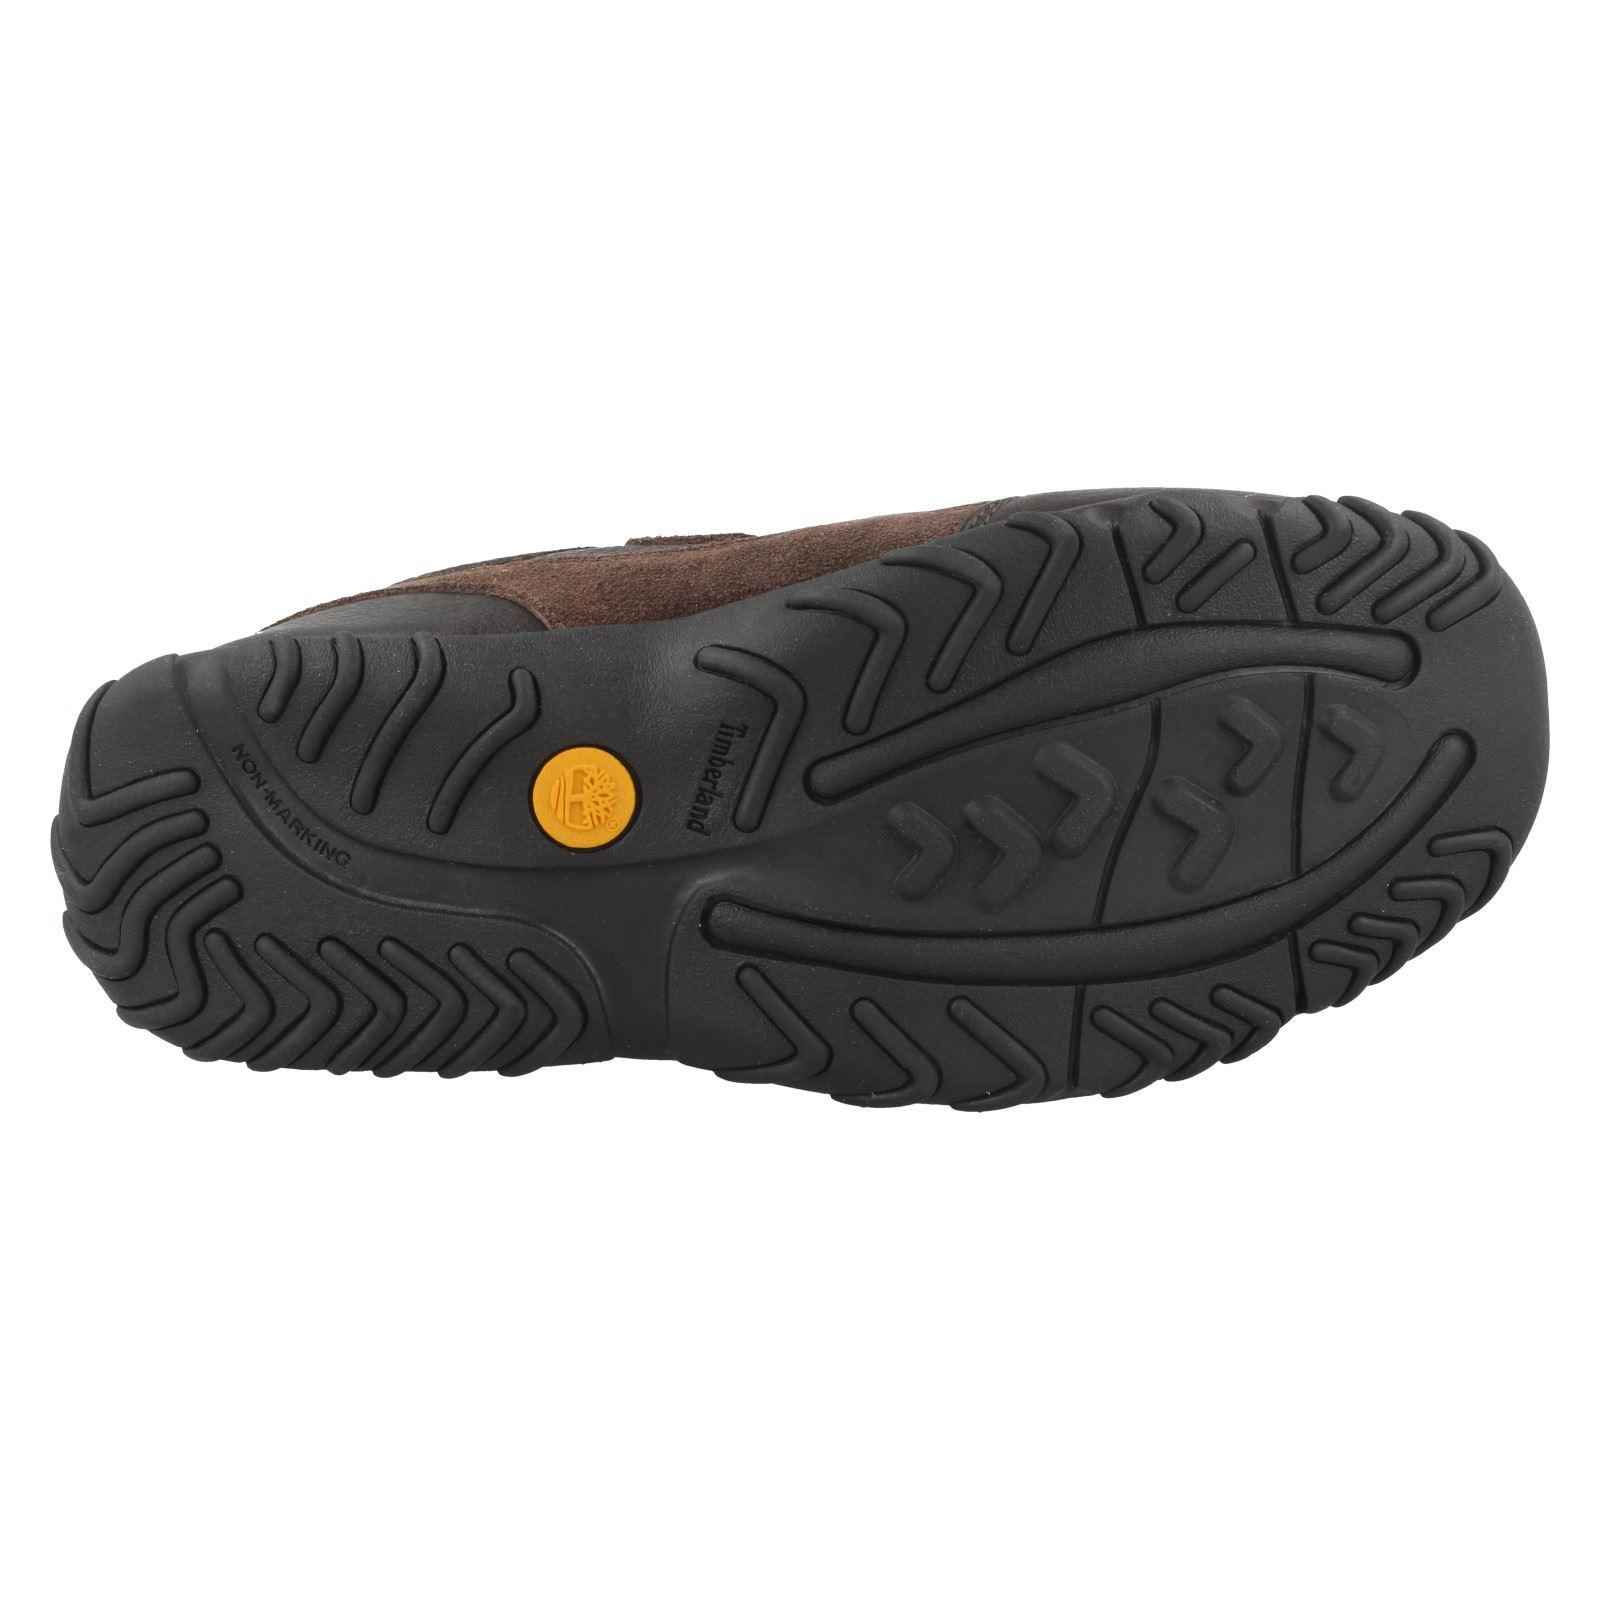 niños inteligentes Timberland Zapatillas para marrón escolares 87959 vPIvq6x